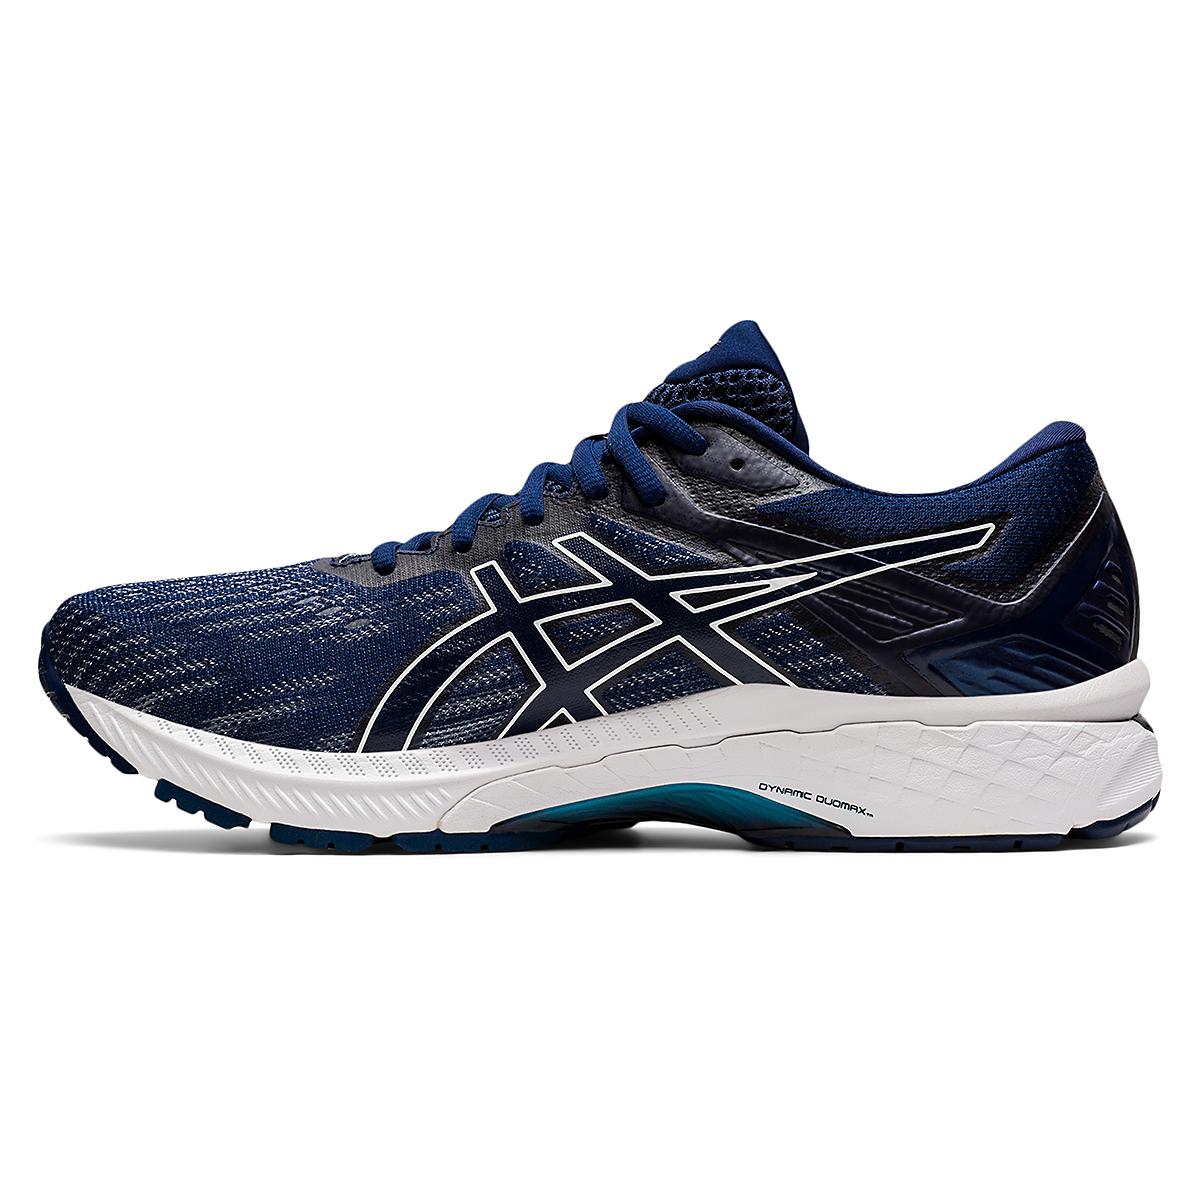 Men's Asics GT-2000 9 Running Shoe - Color: Blue Expanse - Size: 6 - Width: Regular, Blue Expanse, large, image 2